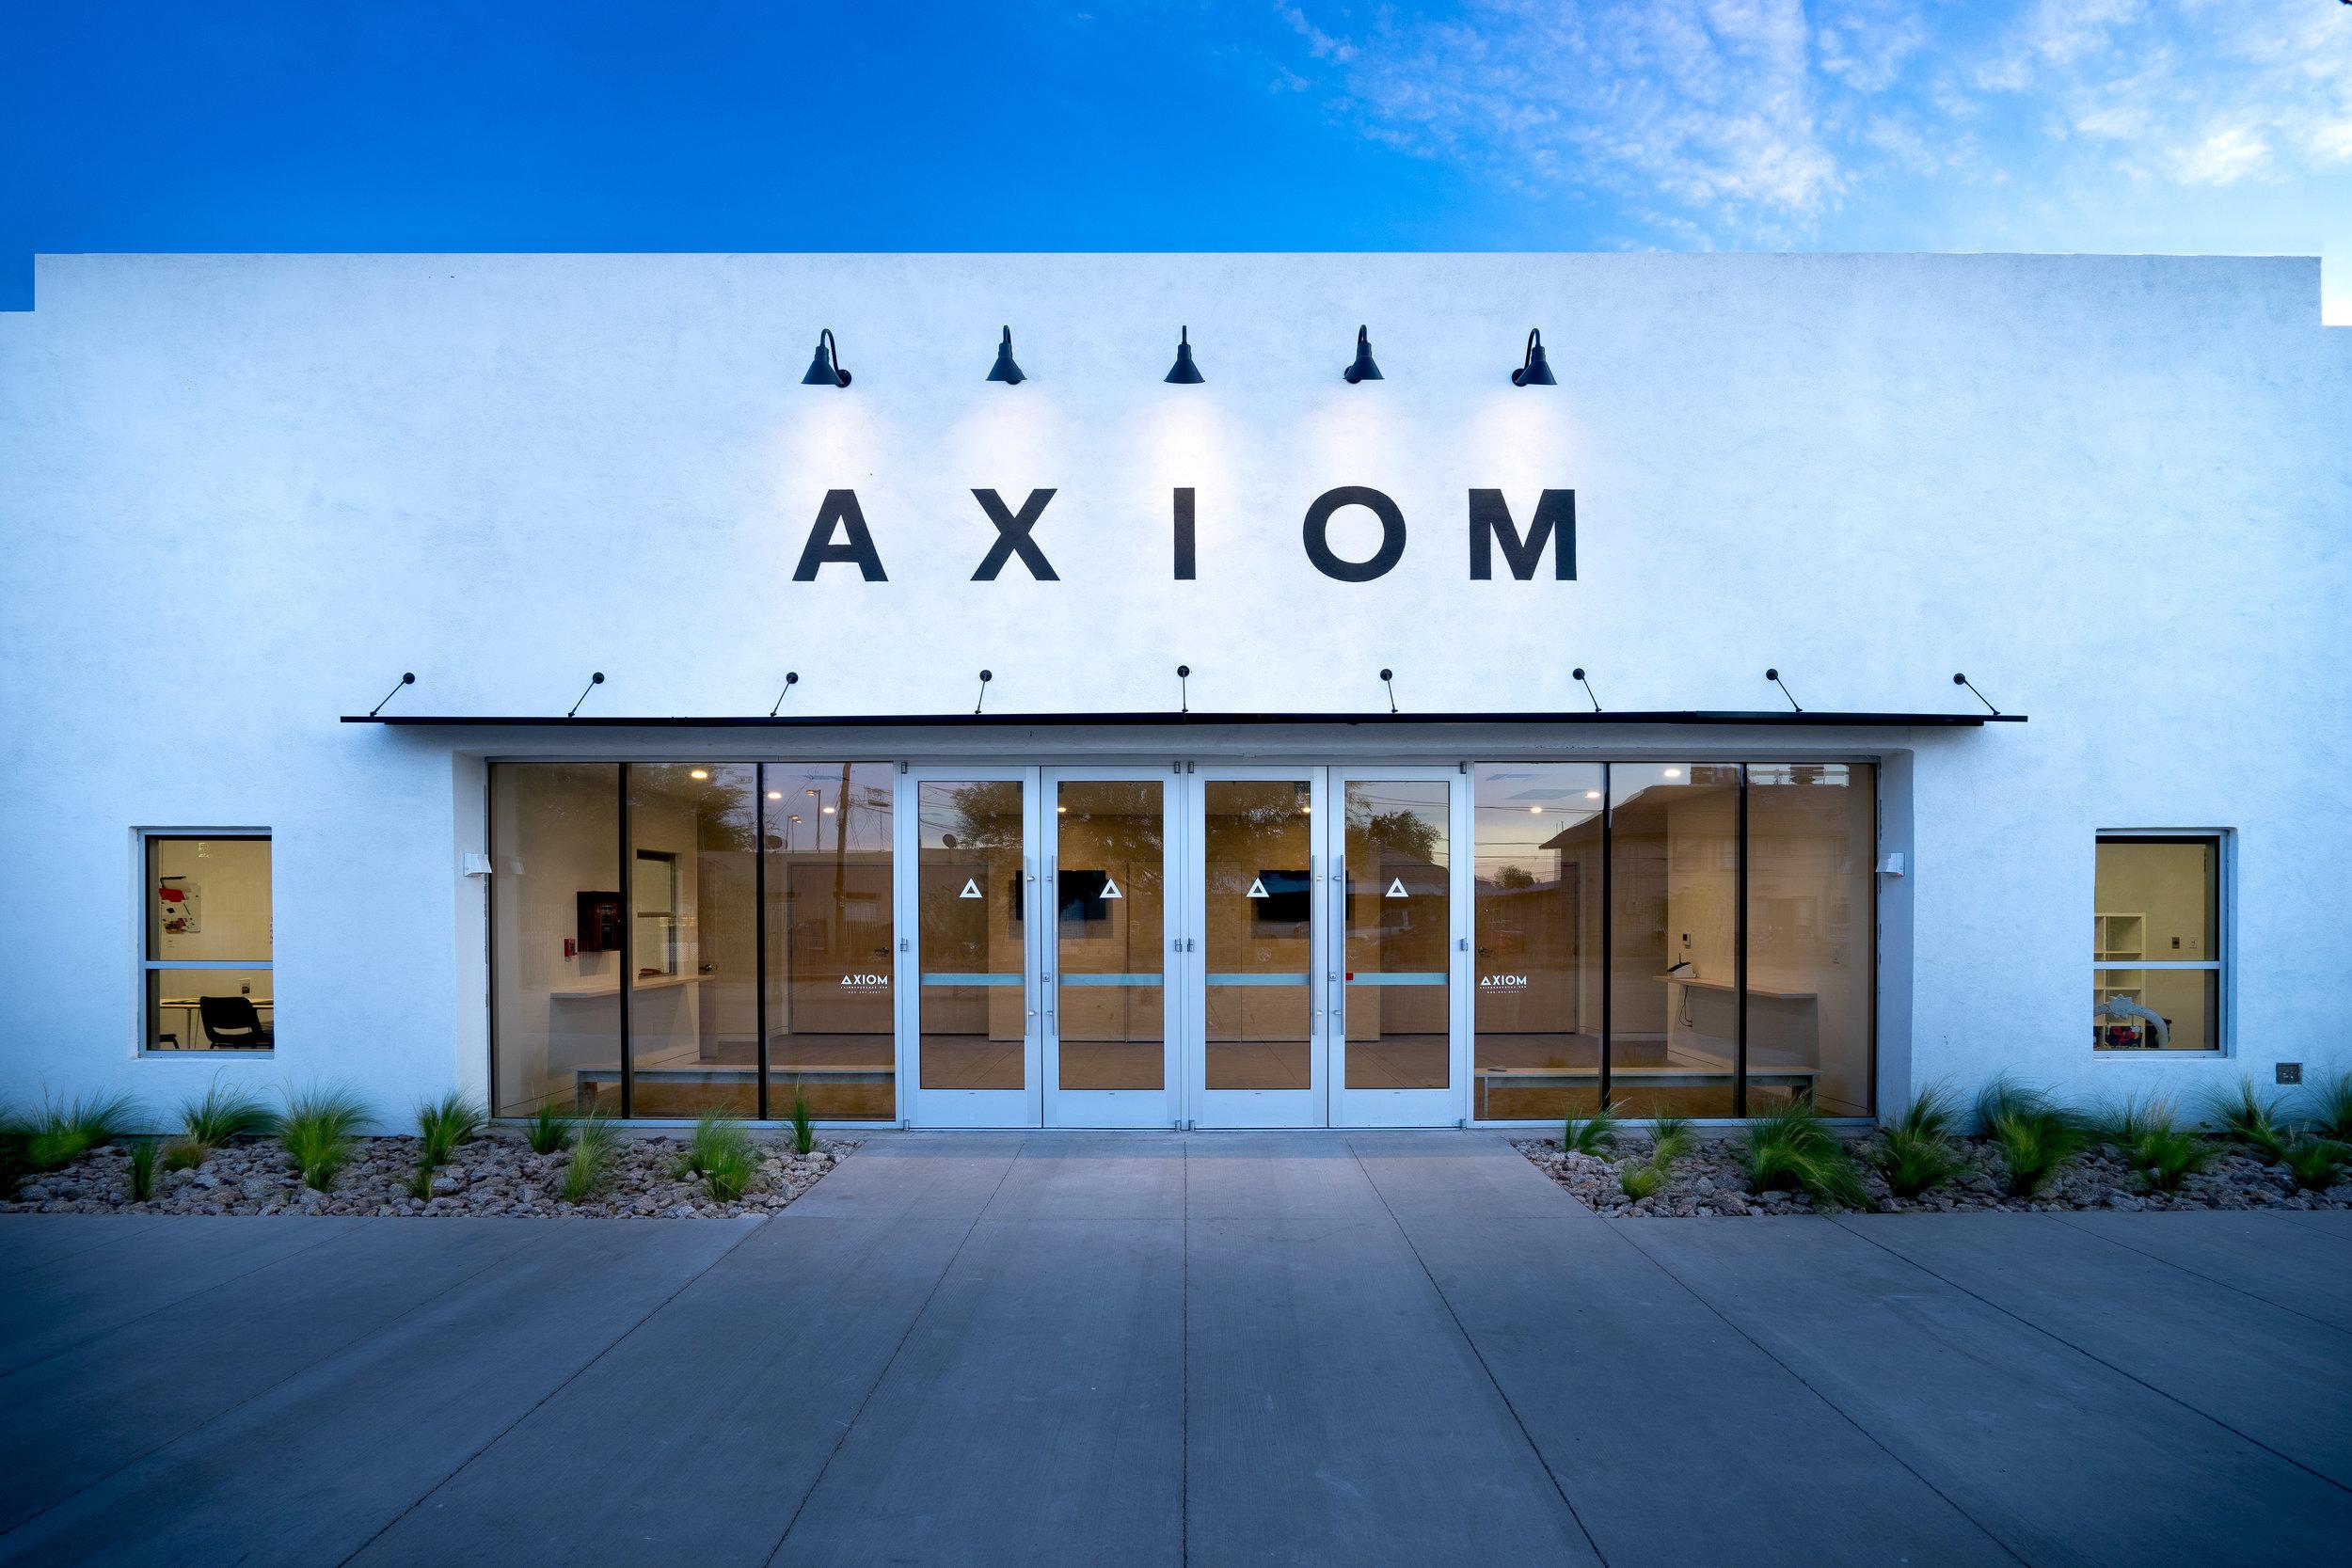 axiom-3.jpg